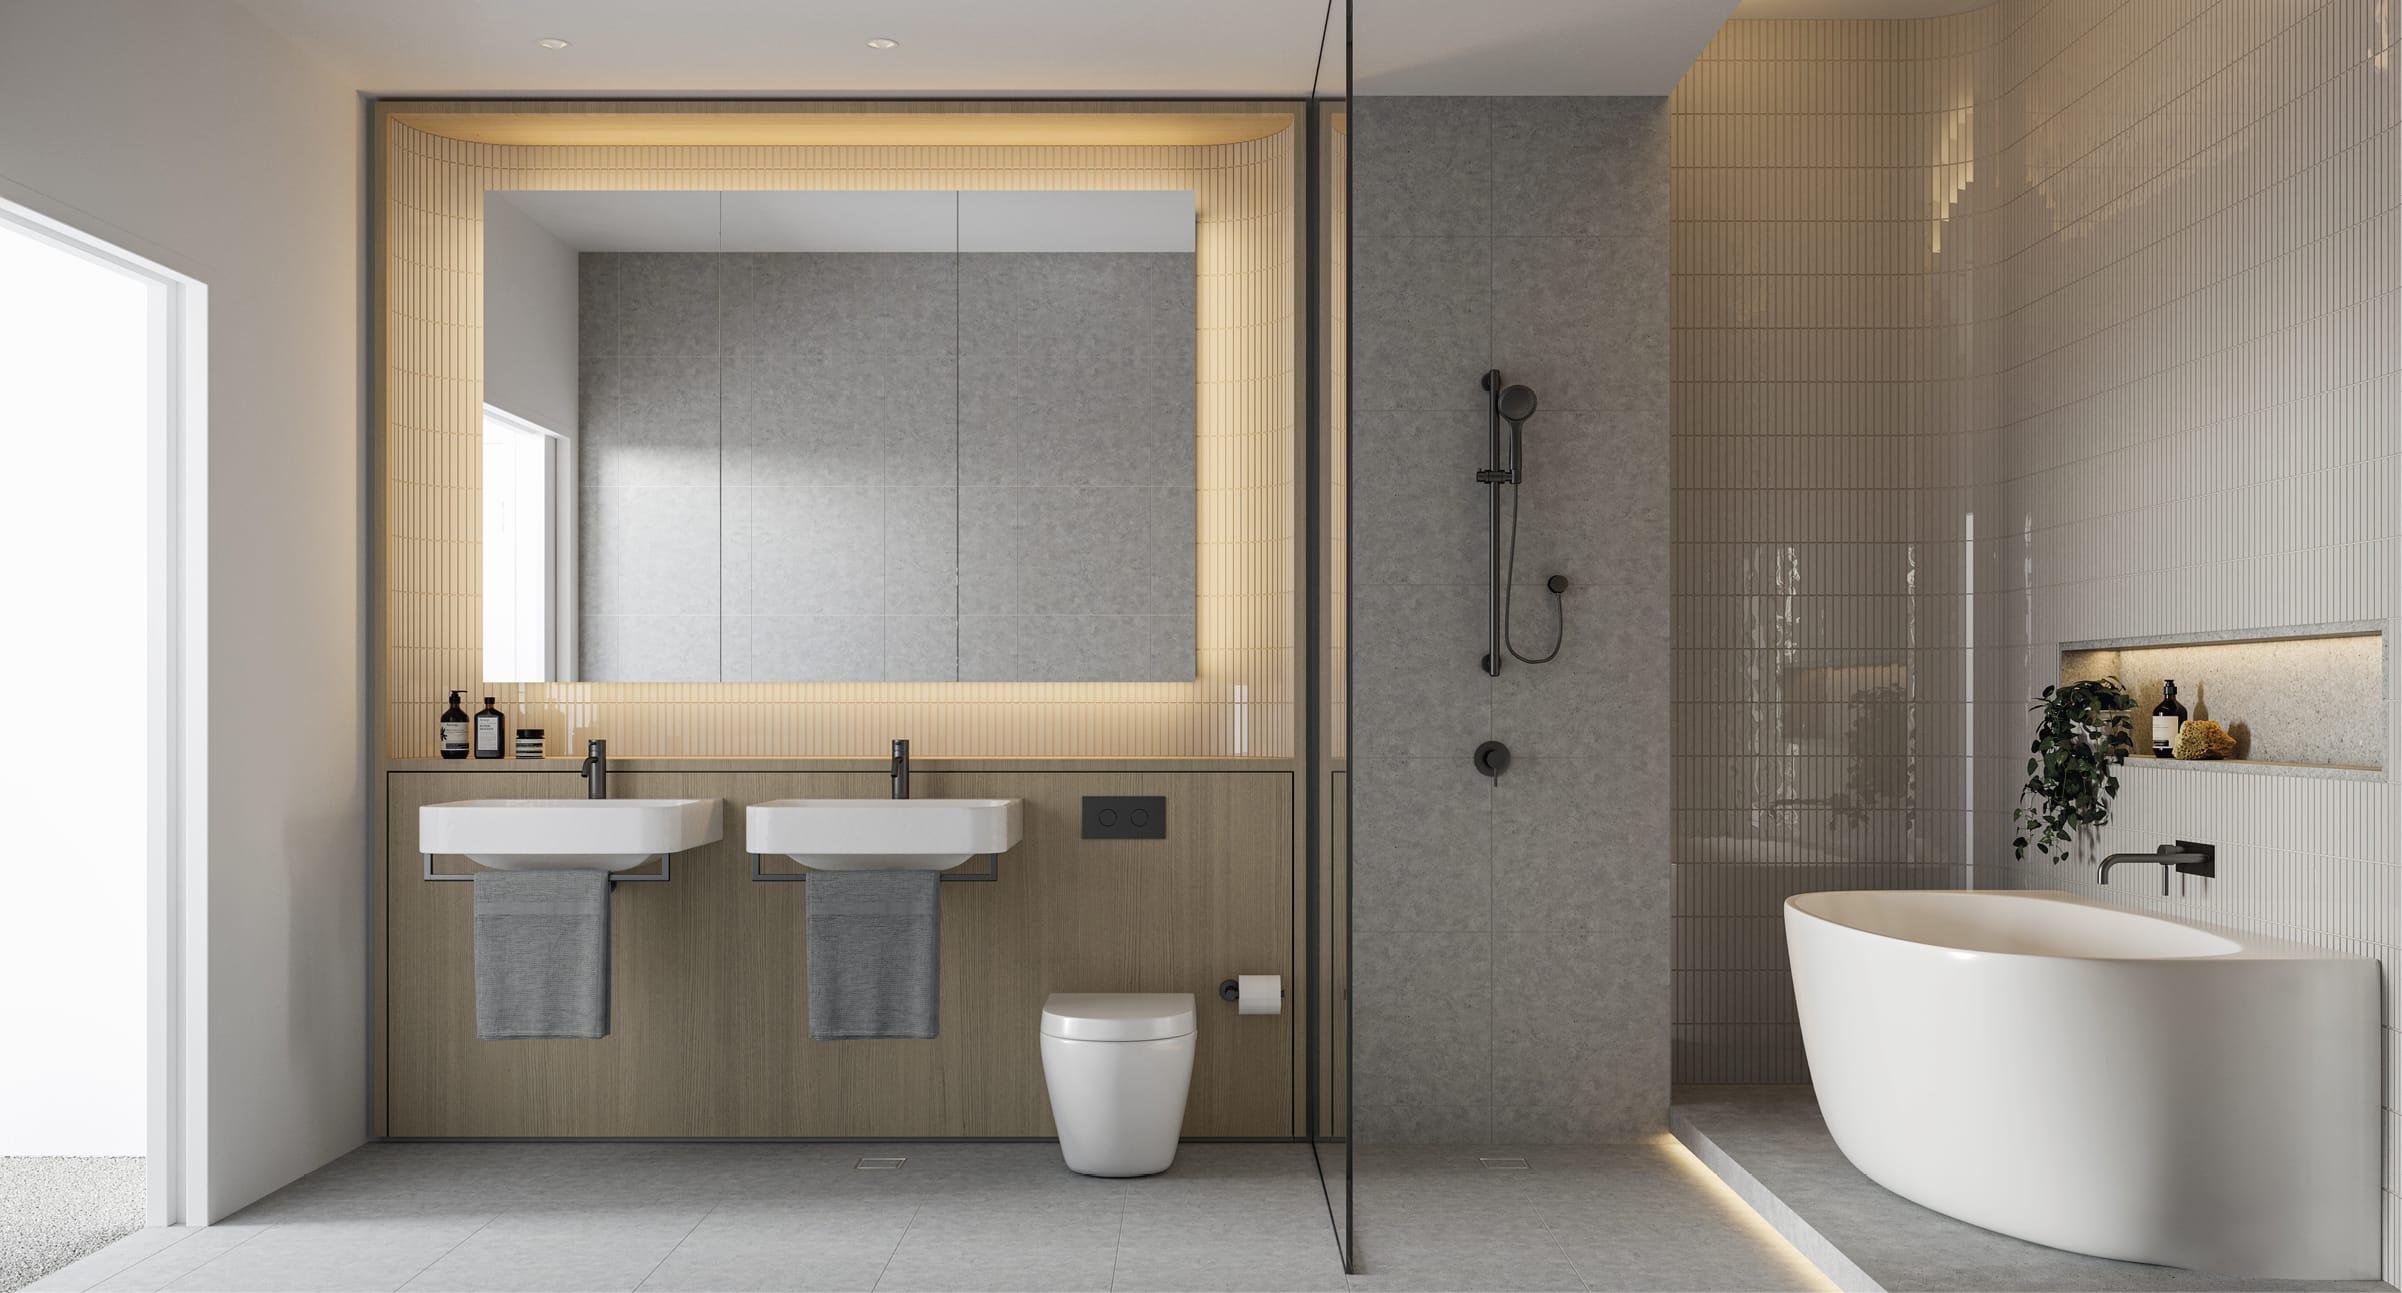 UpperHouse 04 Bath